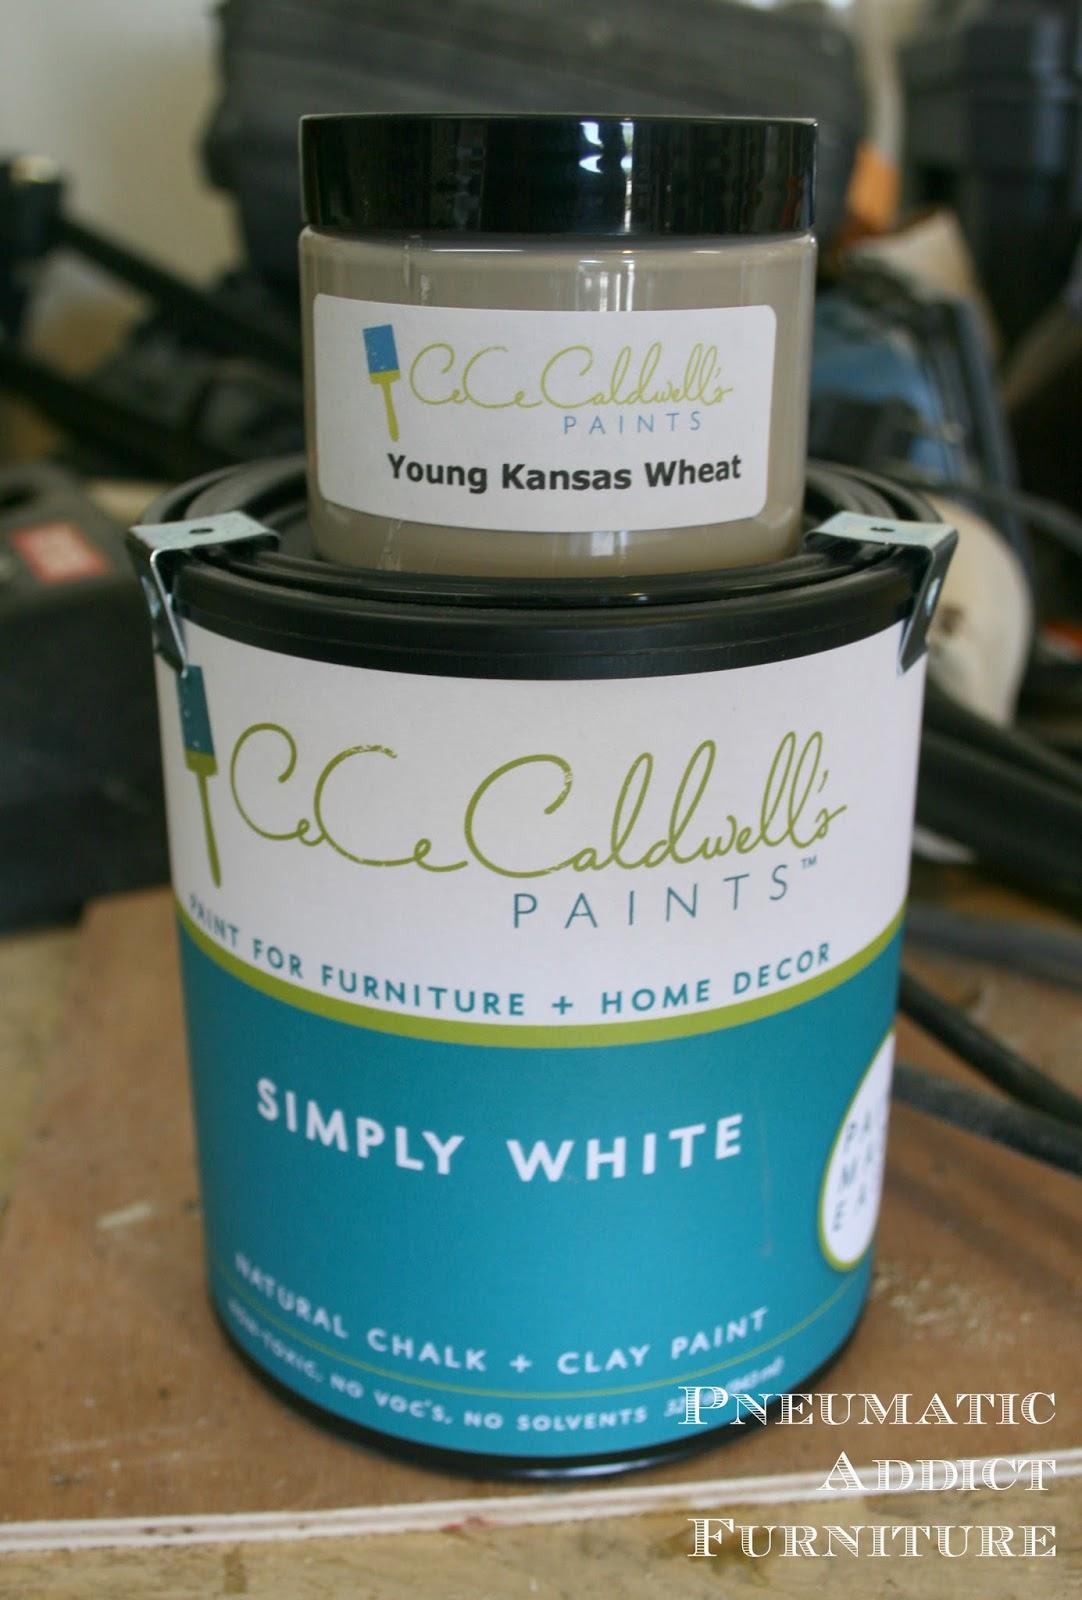 Pneumatic Addict : Custom CeCe Caldwell Blend